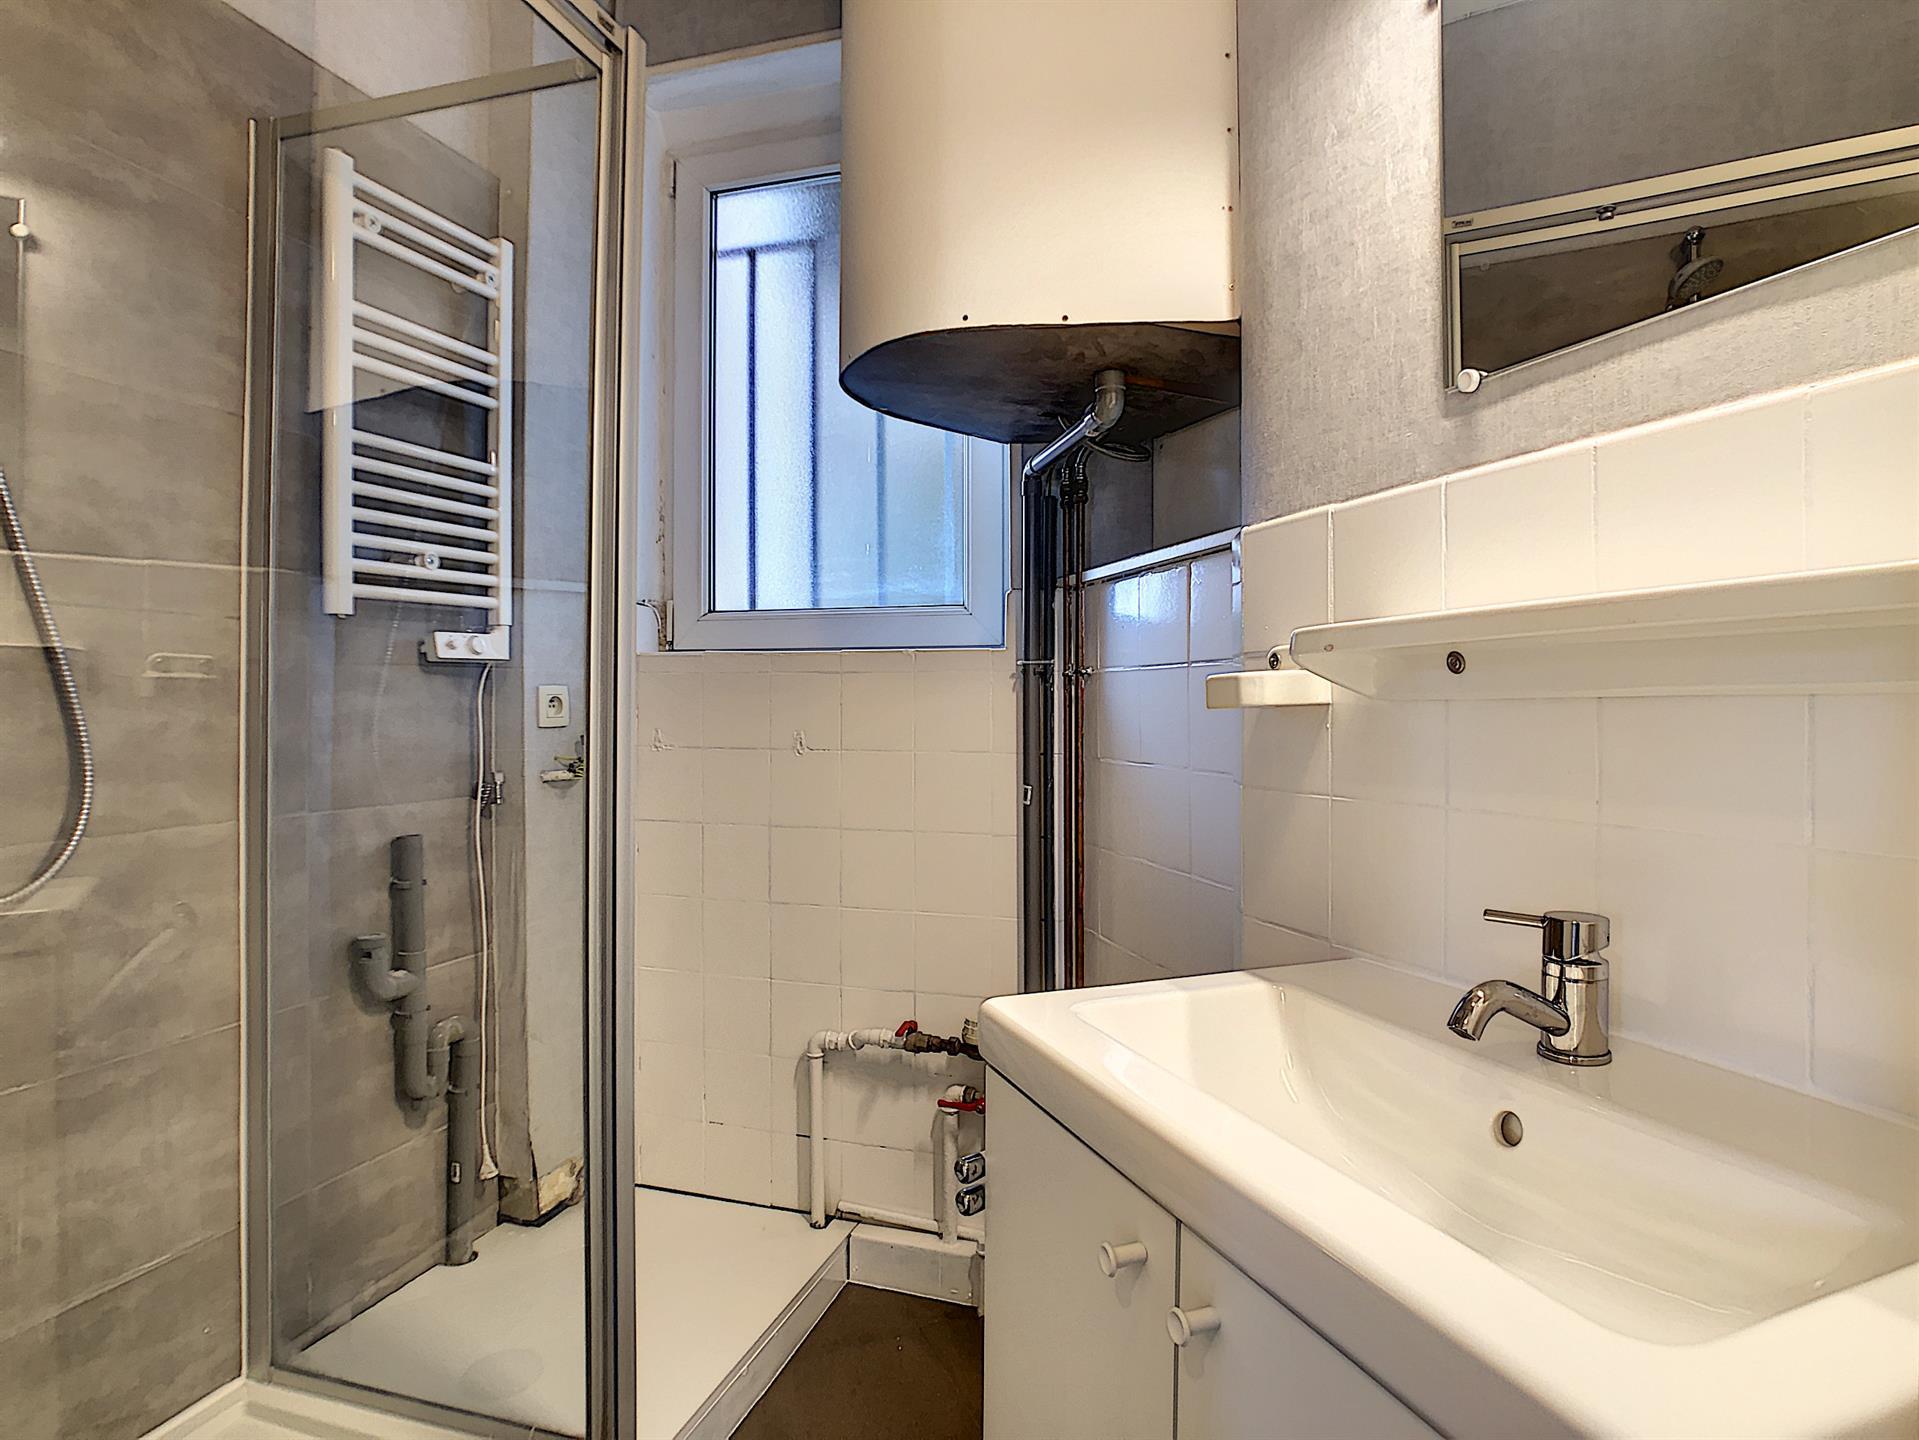 Appartement - Sint-Gillis - #4202152-4